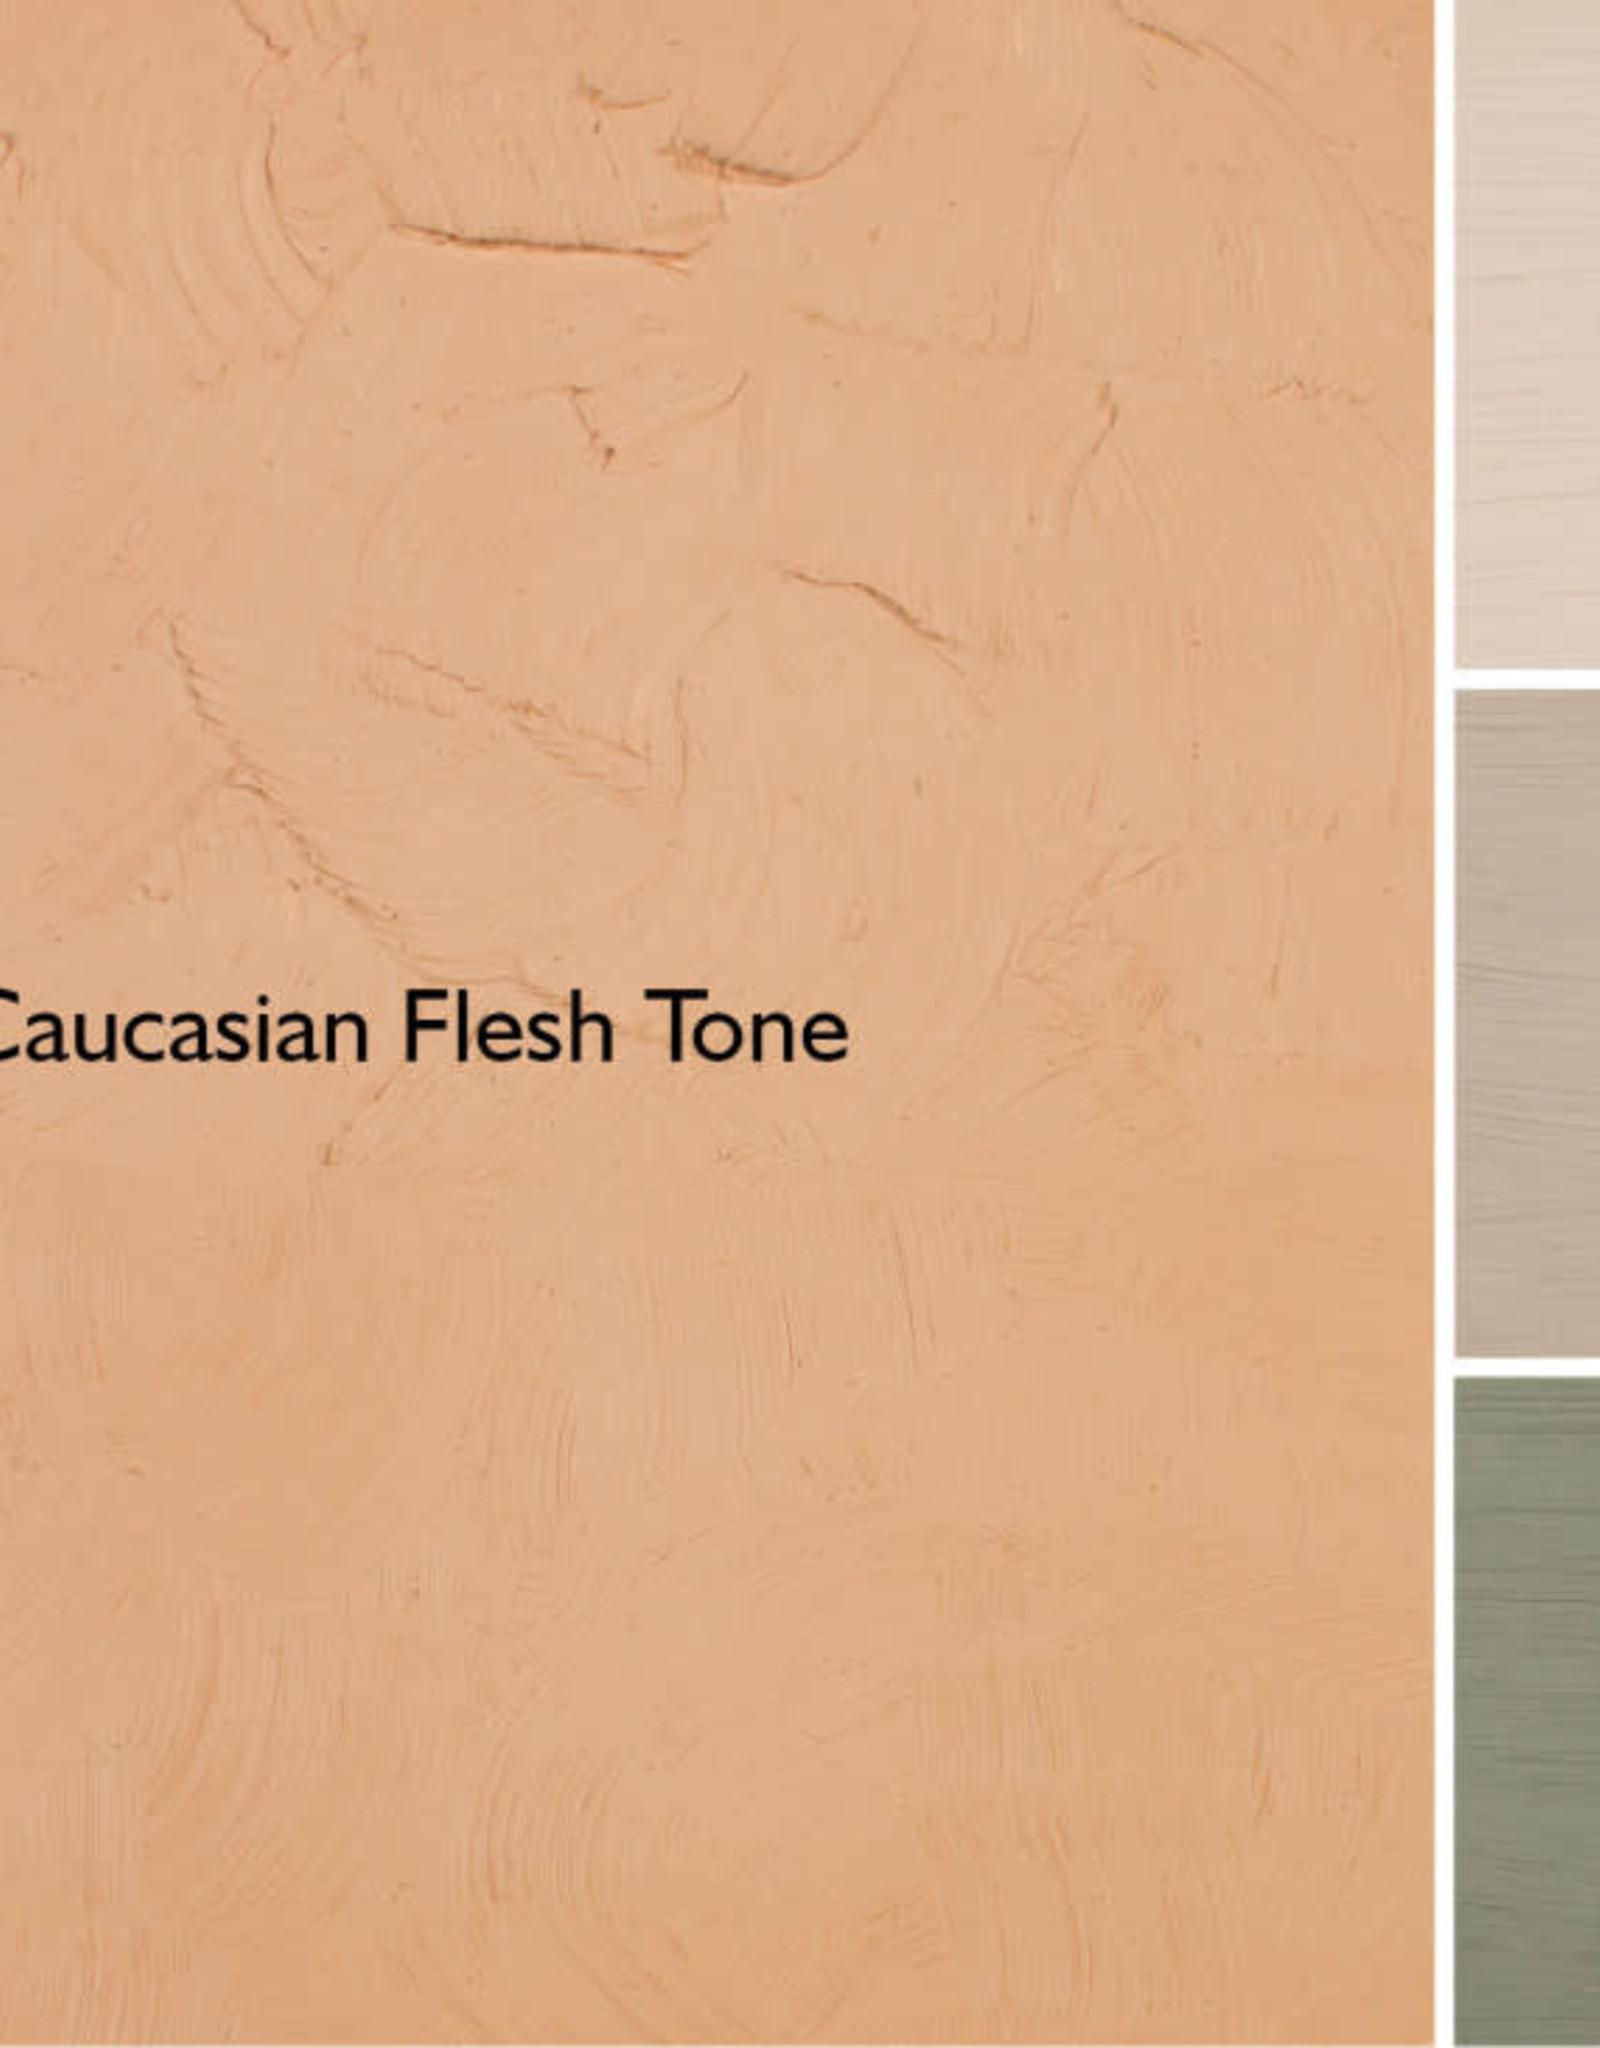 Gamblin Oil Paint, Caucasian Flesh Tone, Series 2, Tube 37ml